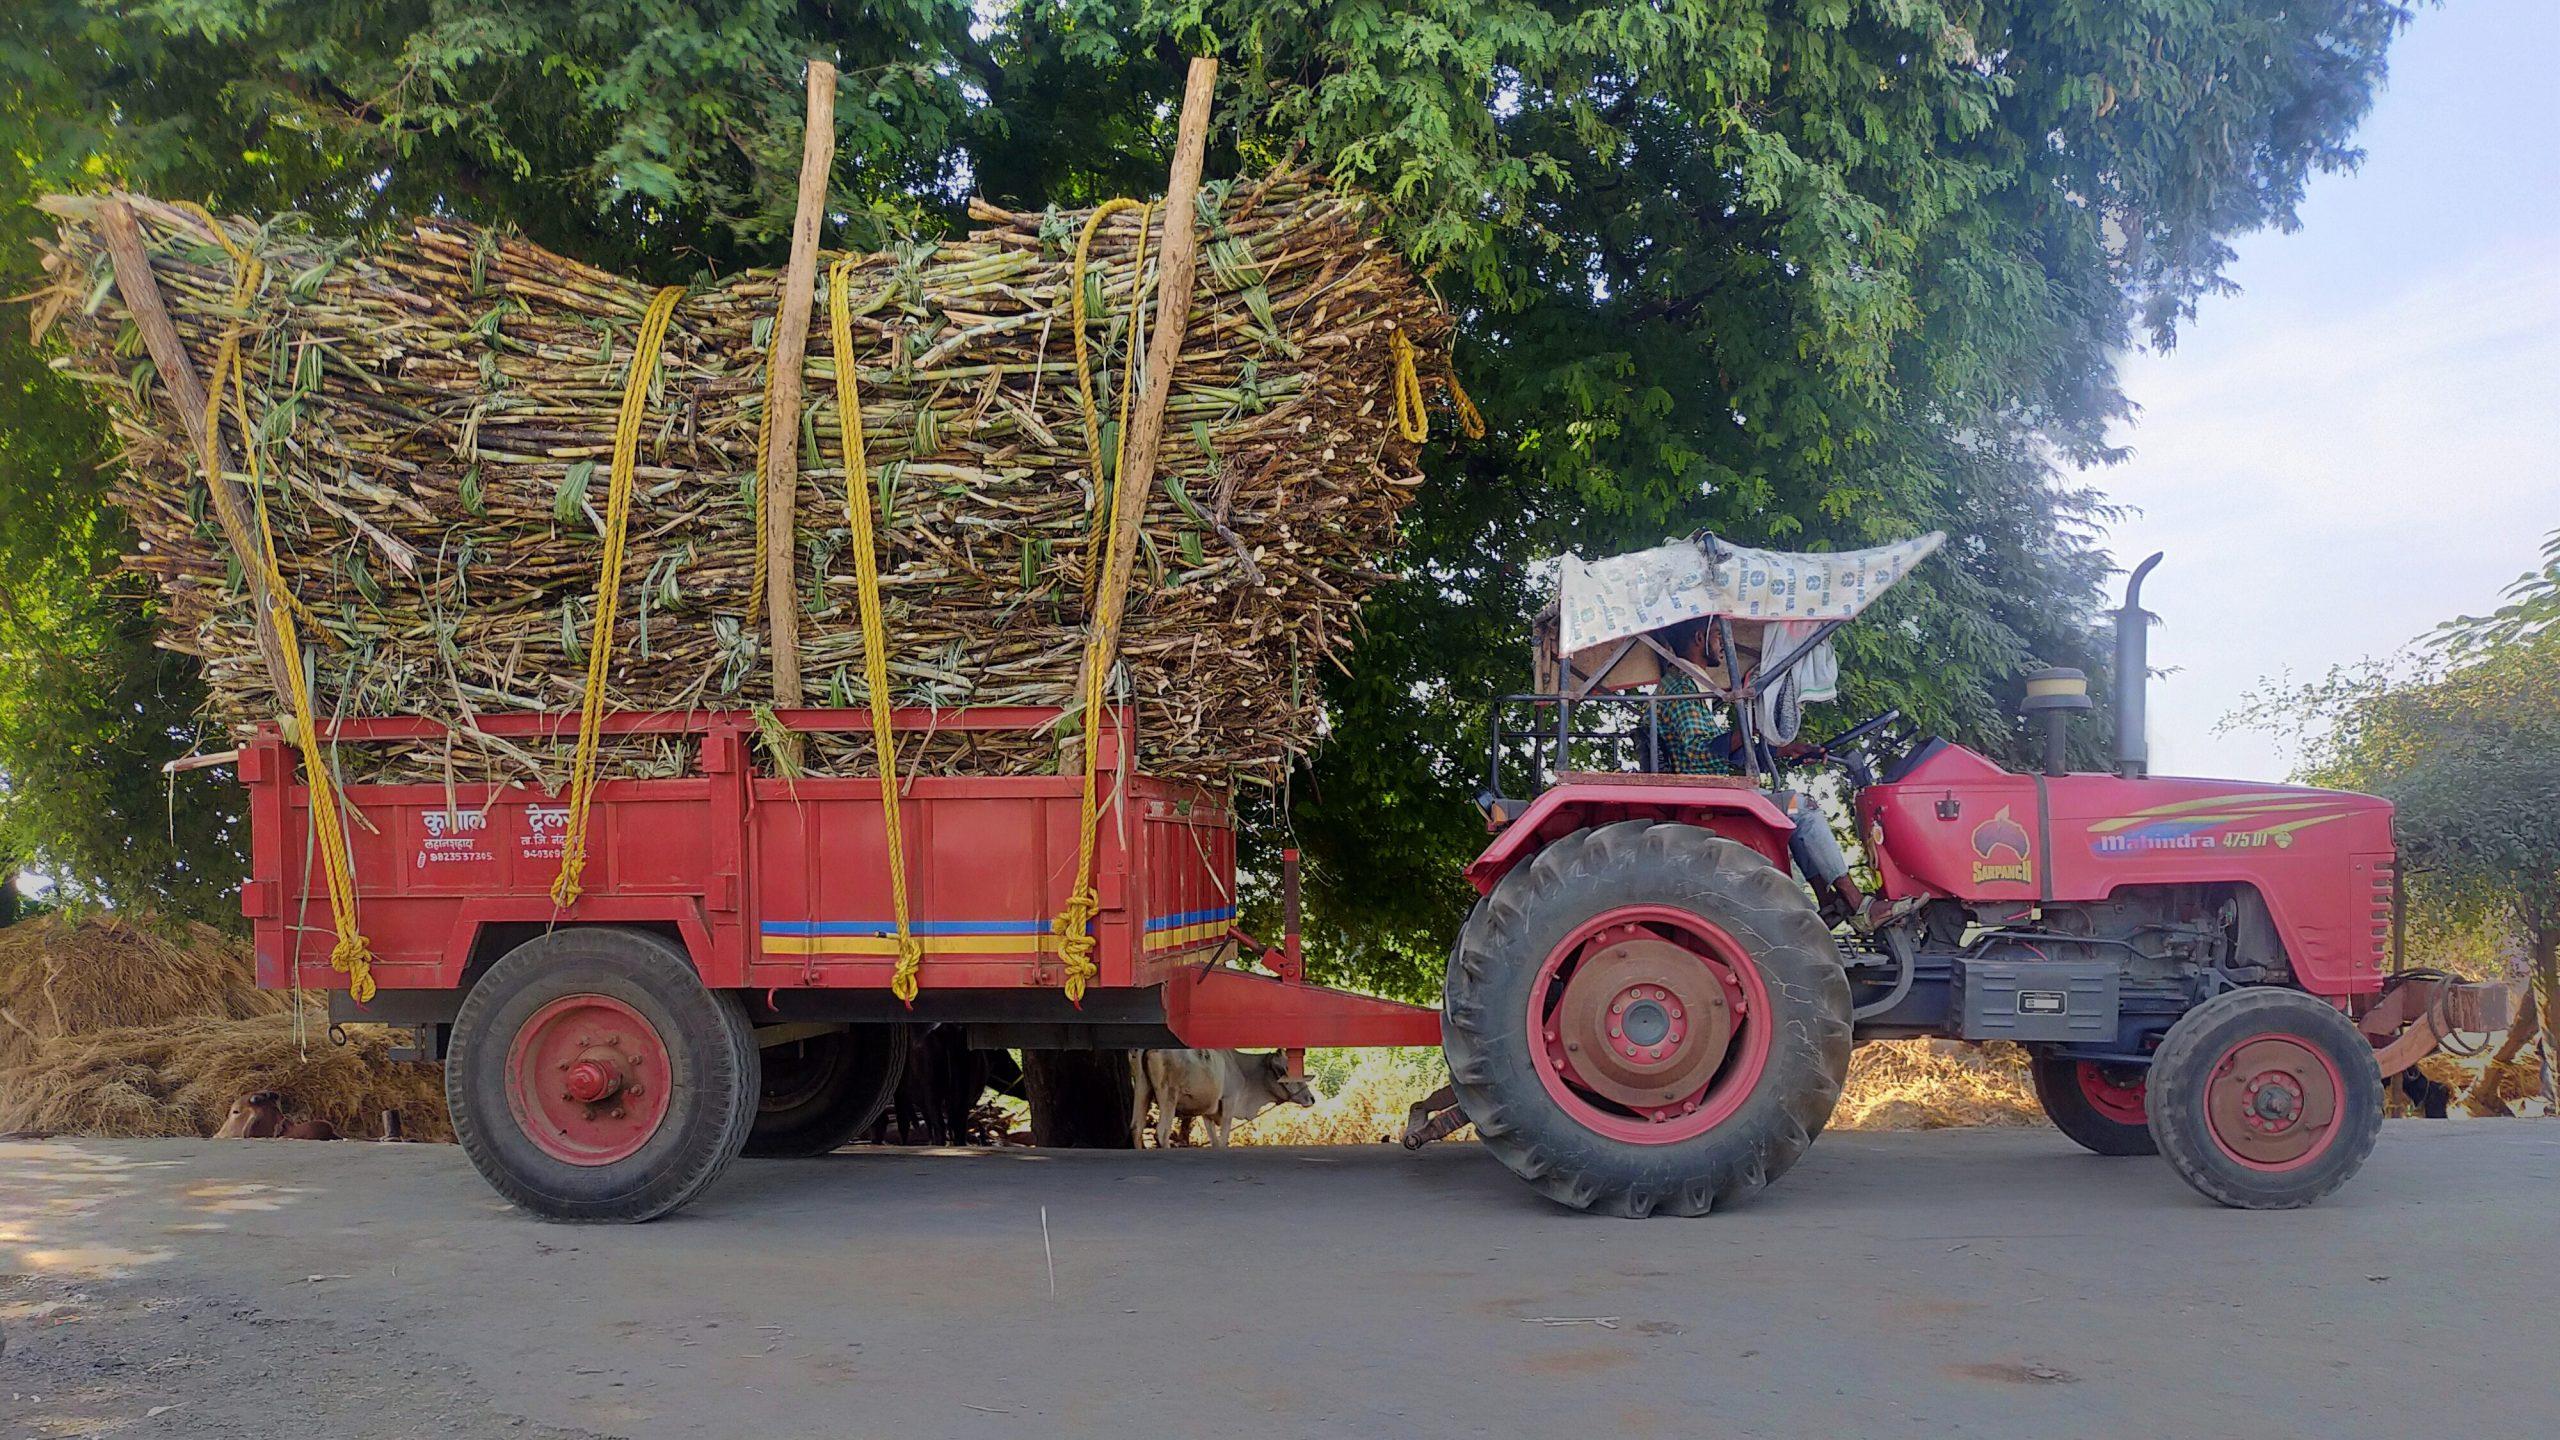 tractor with sugarcanes